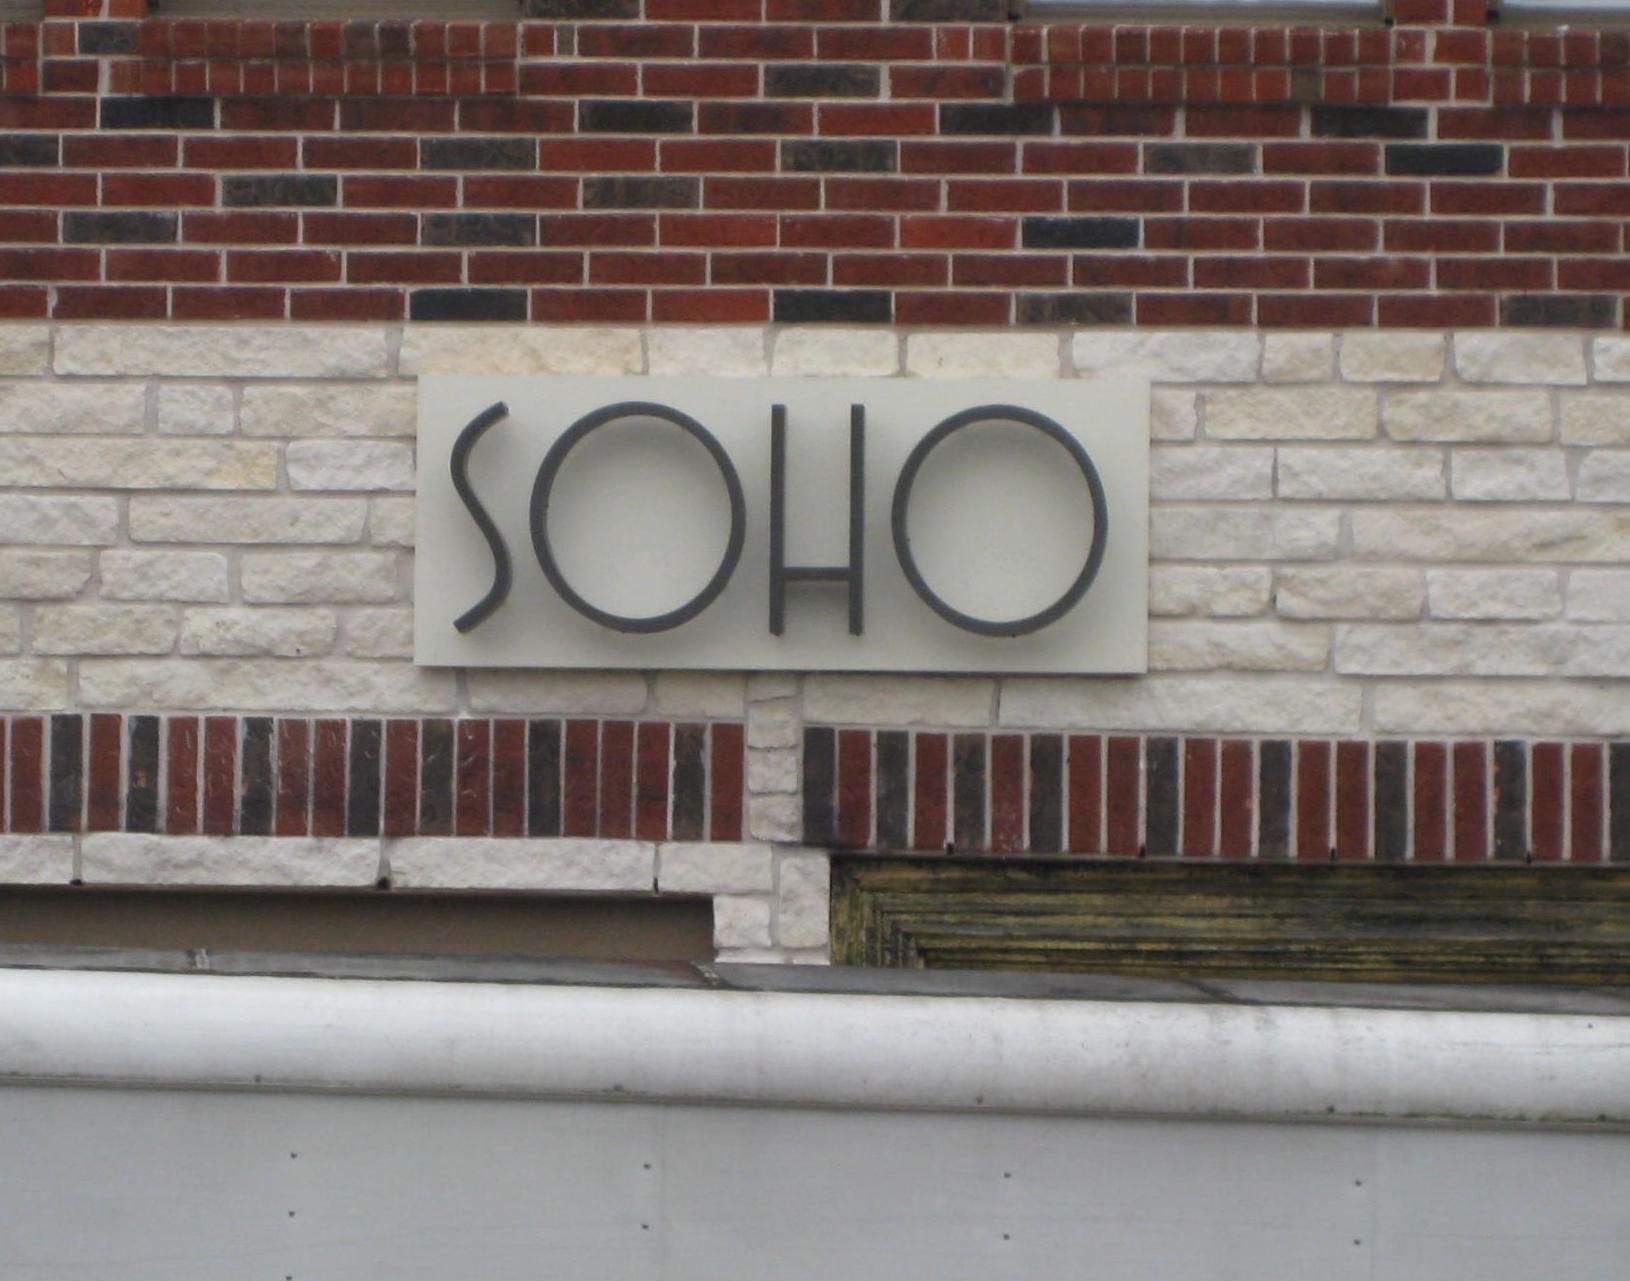 SOHO - Reverse - Halo lit channel letter sign